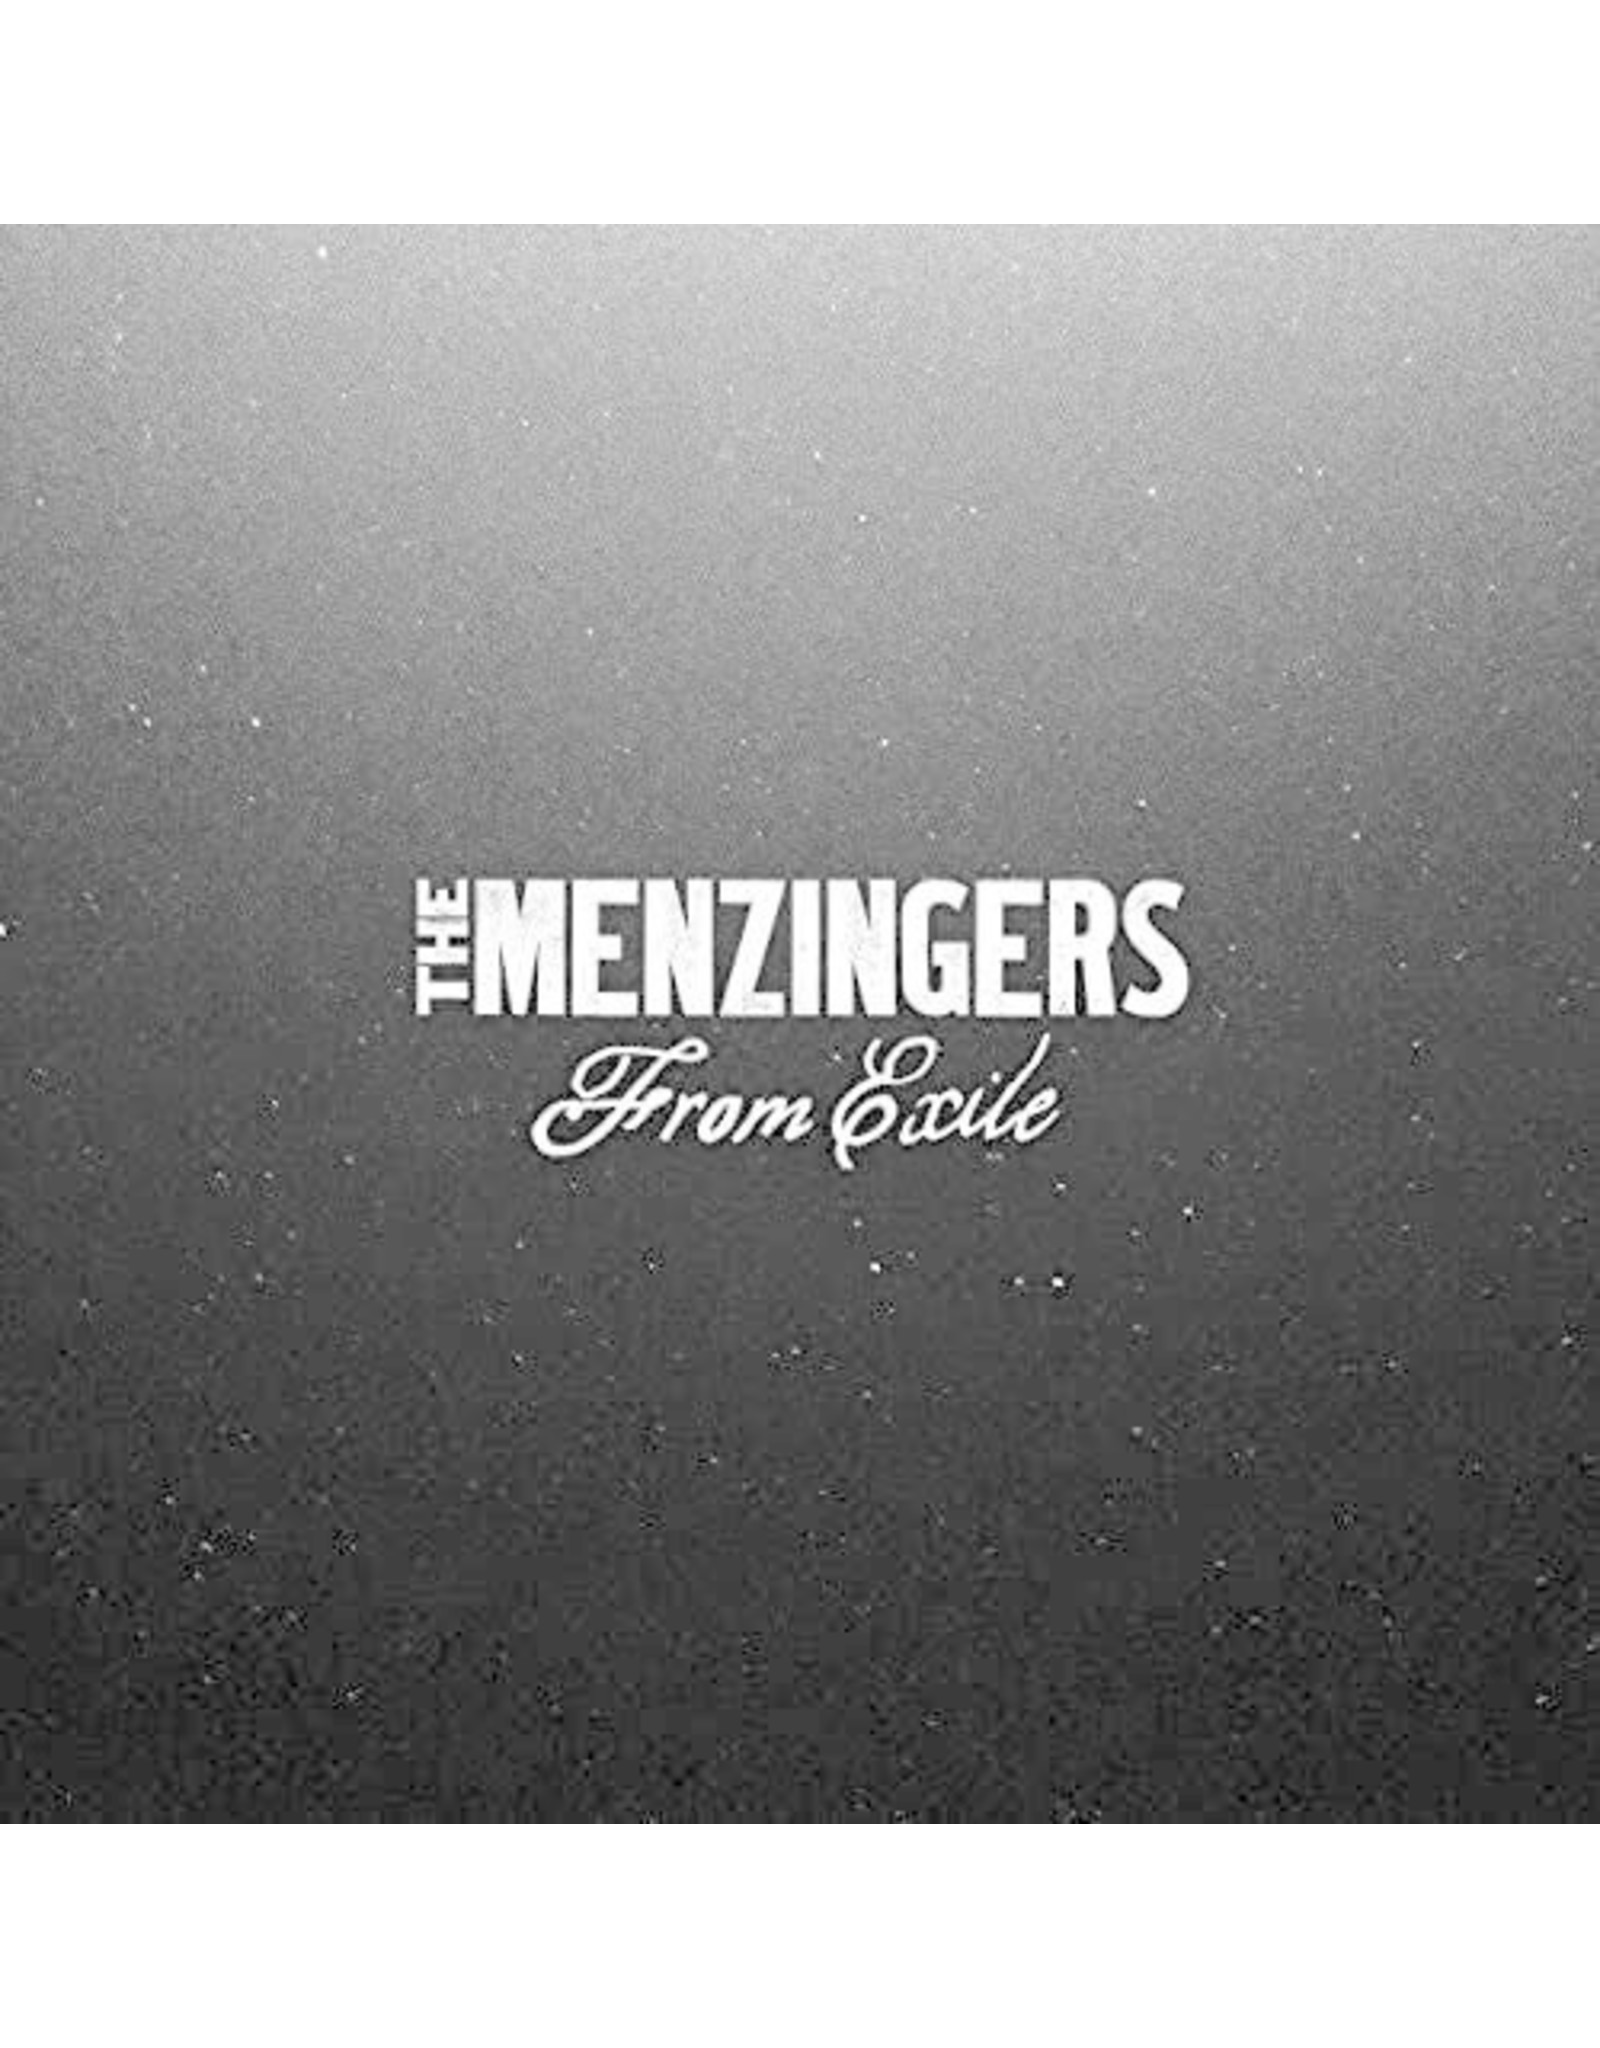 New Vinyl The Menzingers - From Exile LP